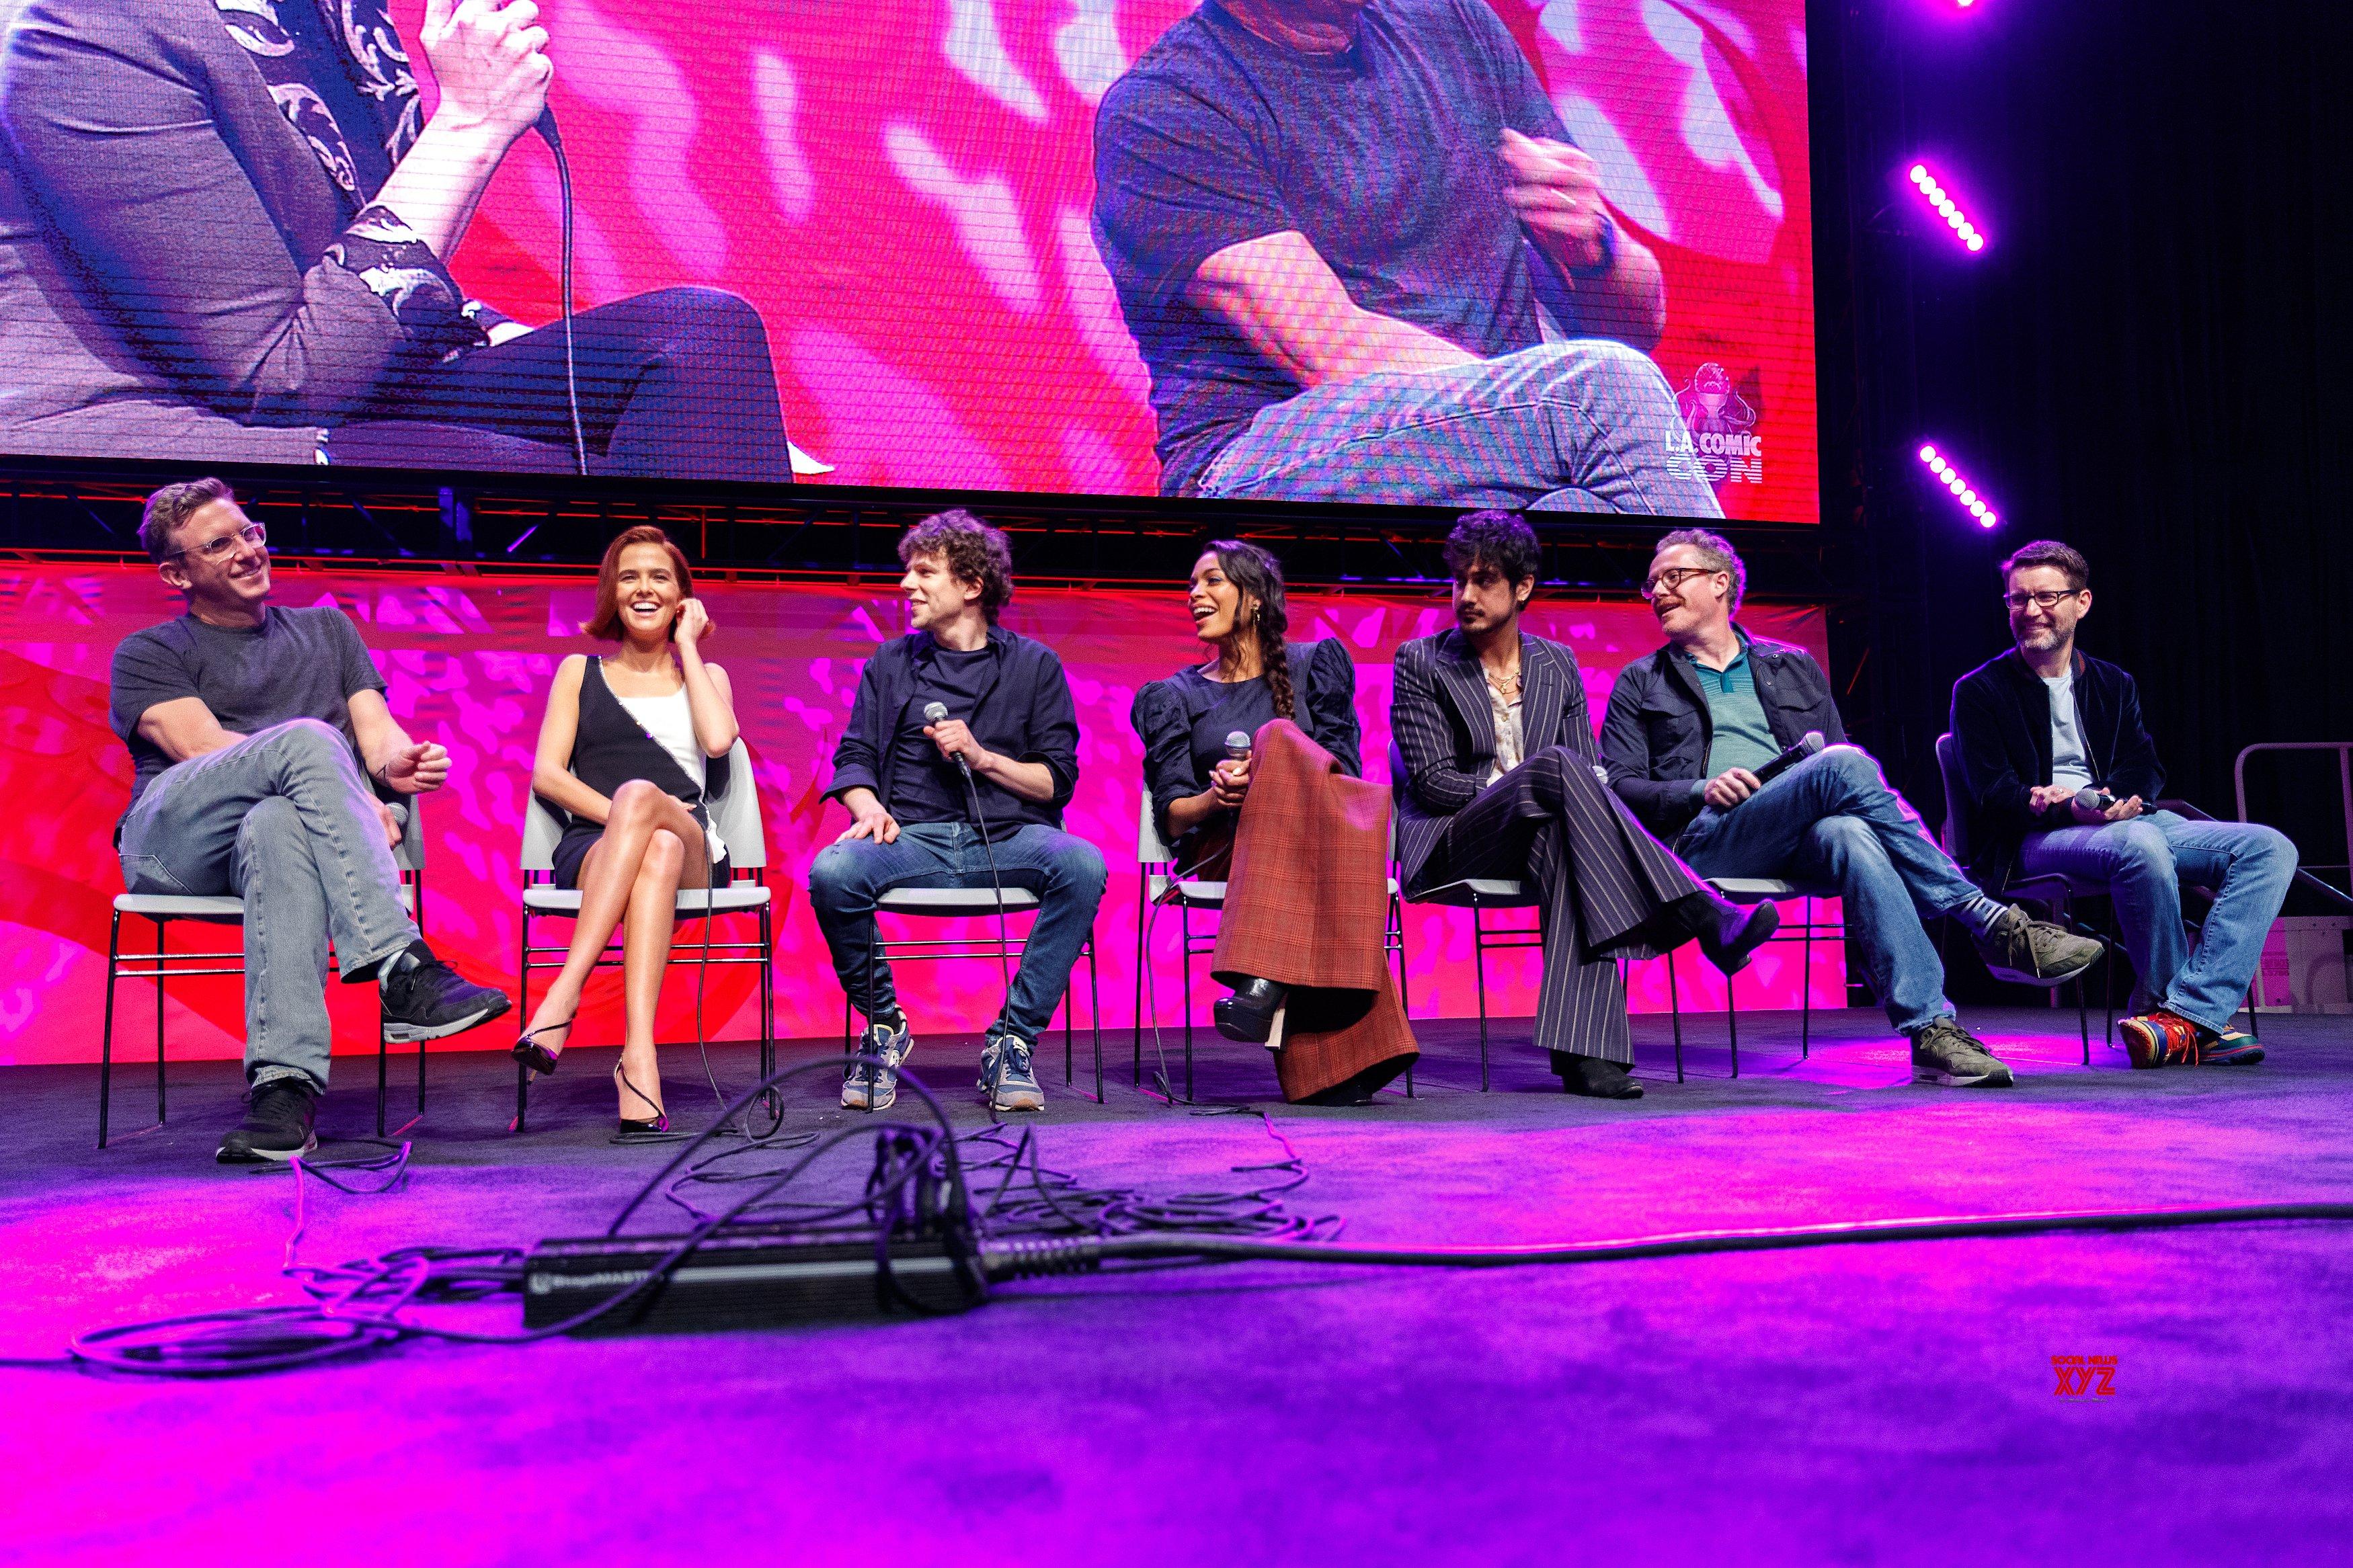 Zombieland: Double Tap Movie LA Comic Con And Surprise Screening HD Gallery